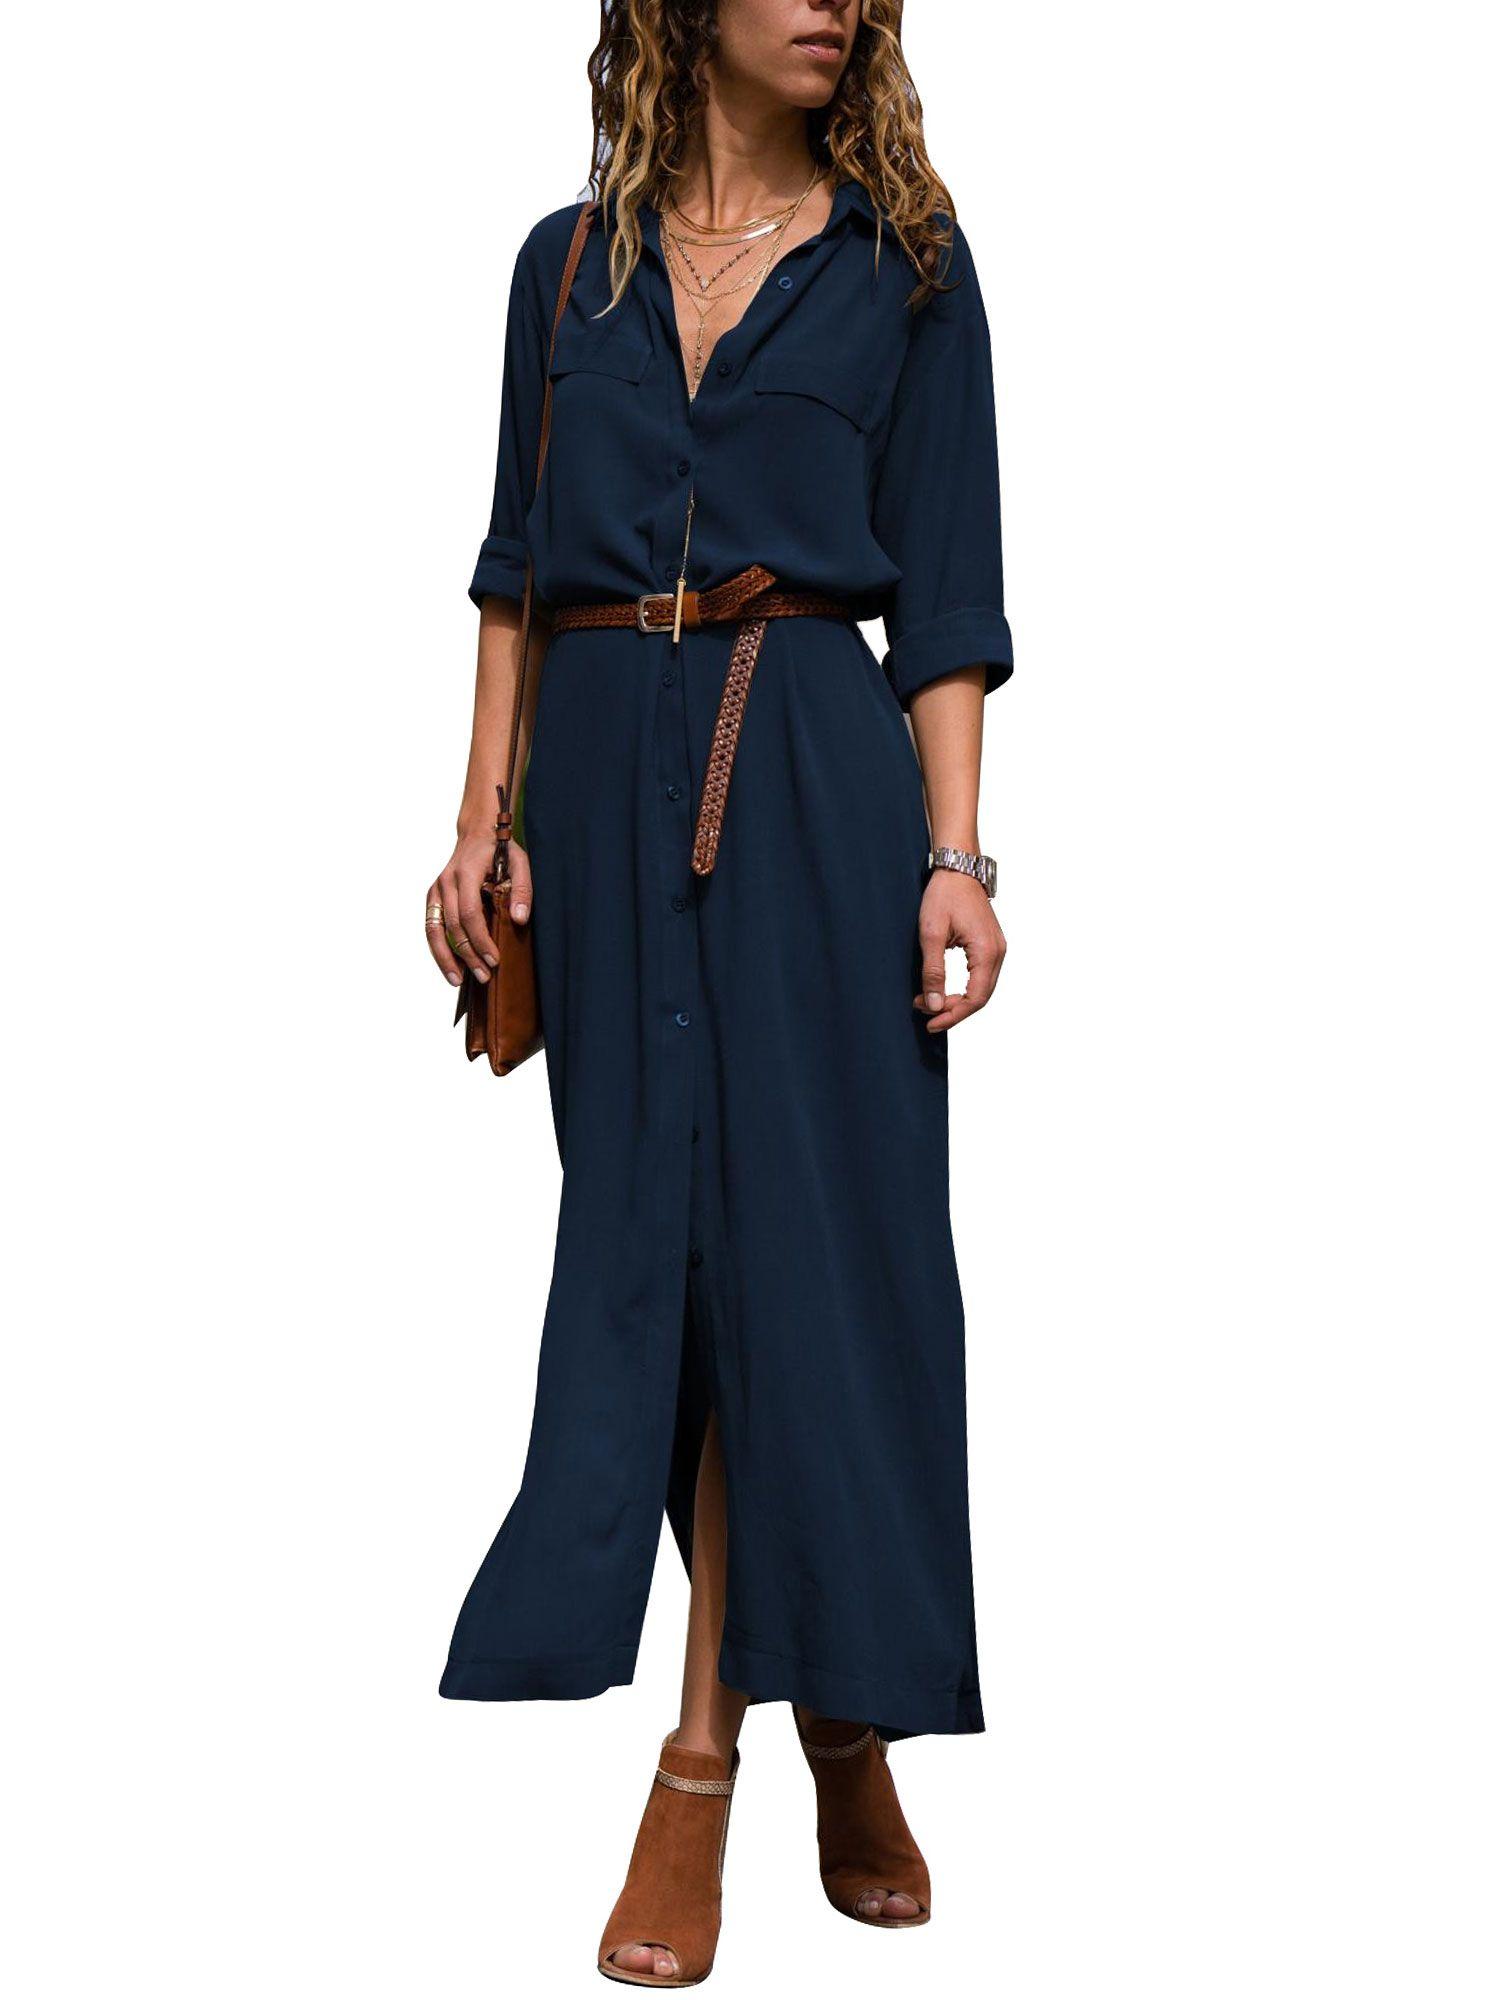 a58c77fe643 Lapel V Neck Button Shirt Dresses for Women Maxi Long Sleeve Casual Solid  Color Loose Boho Tea Dress Side Split Sun Dress Maxi